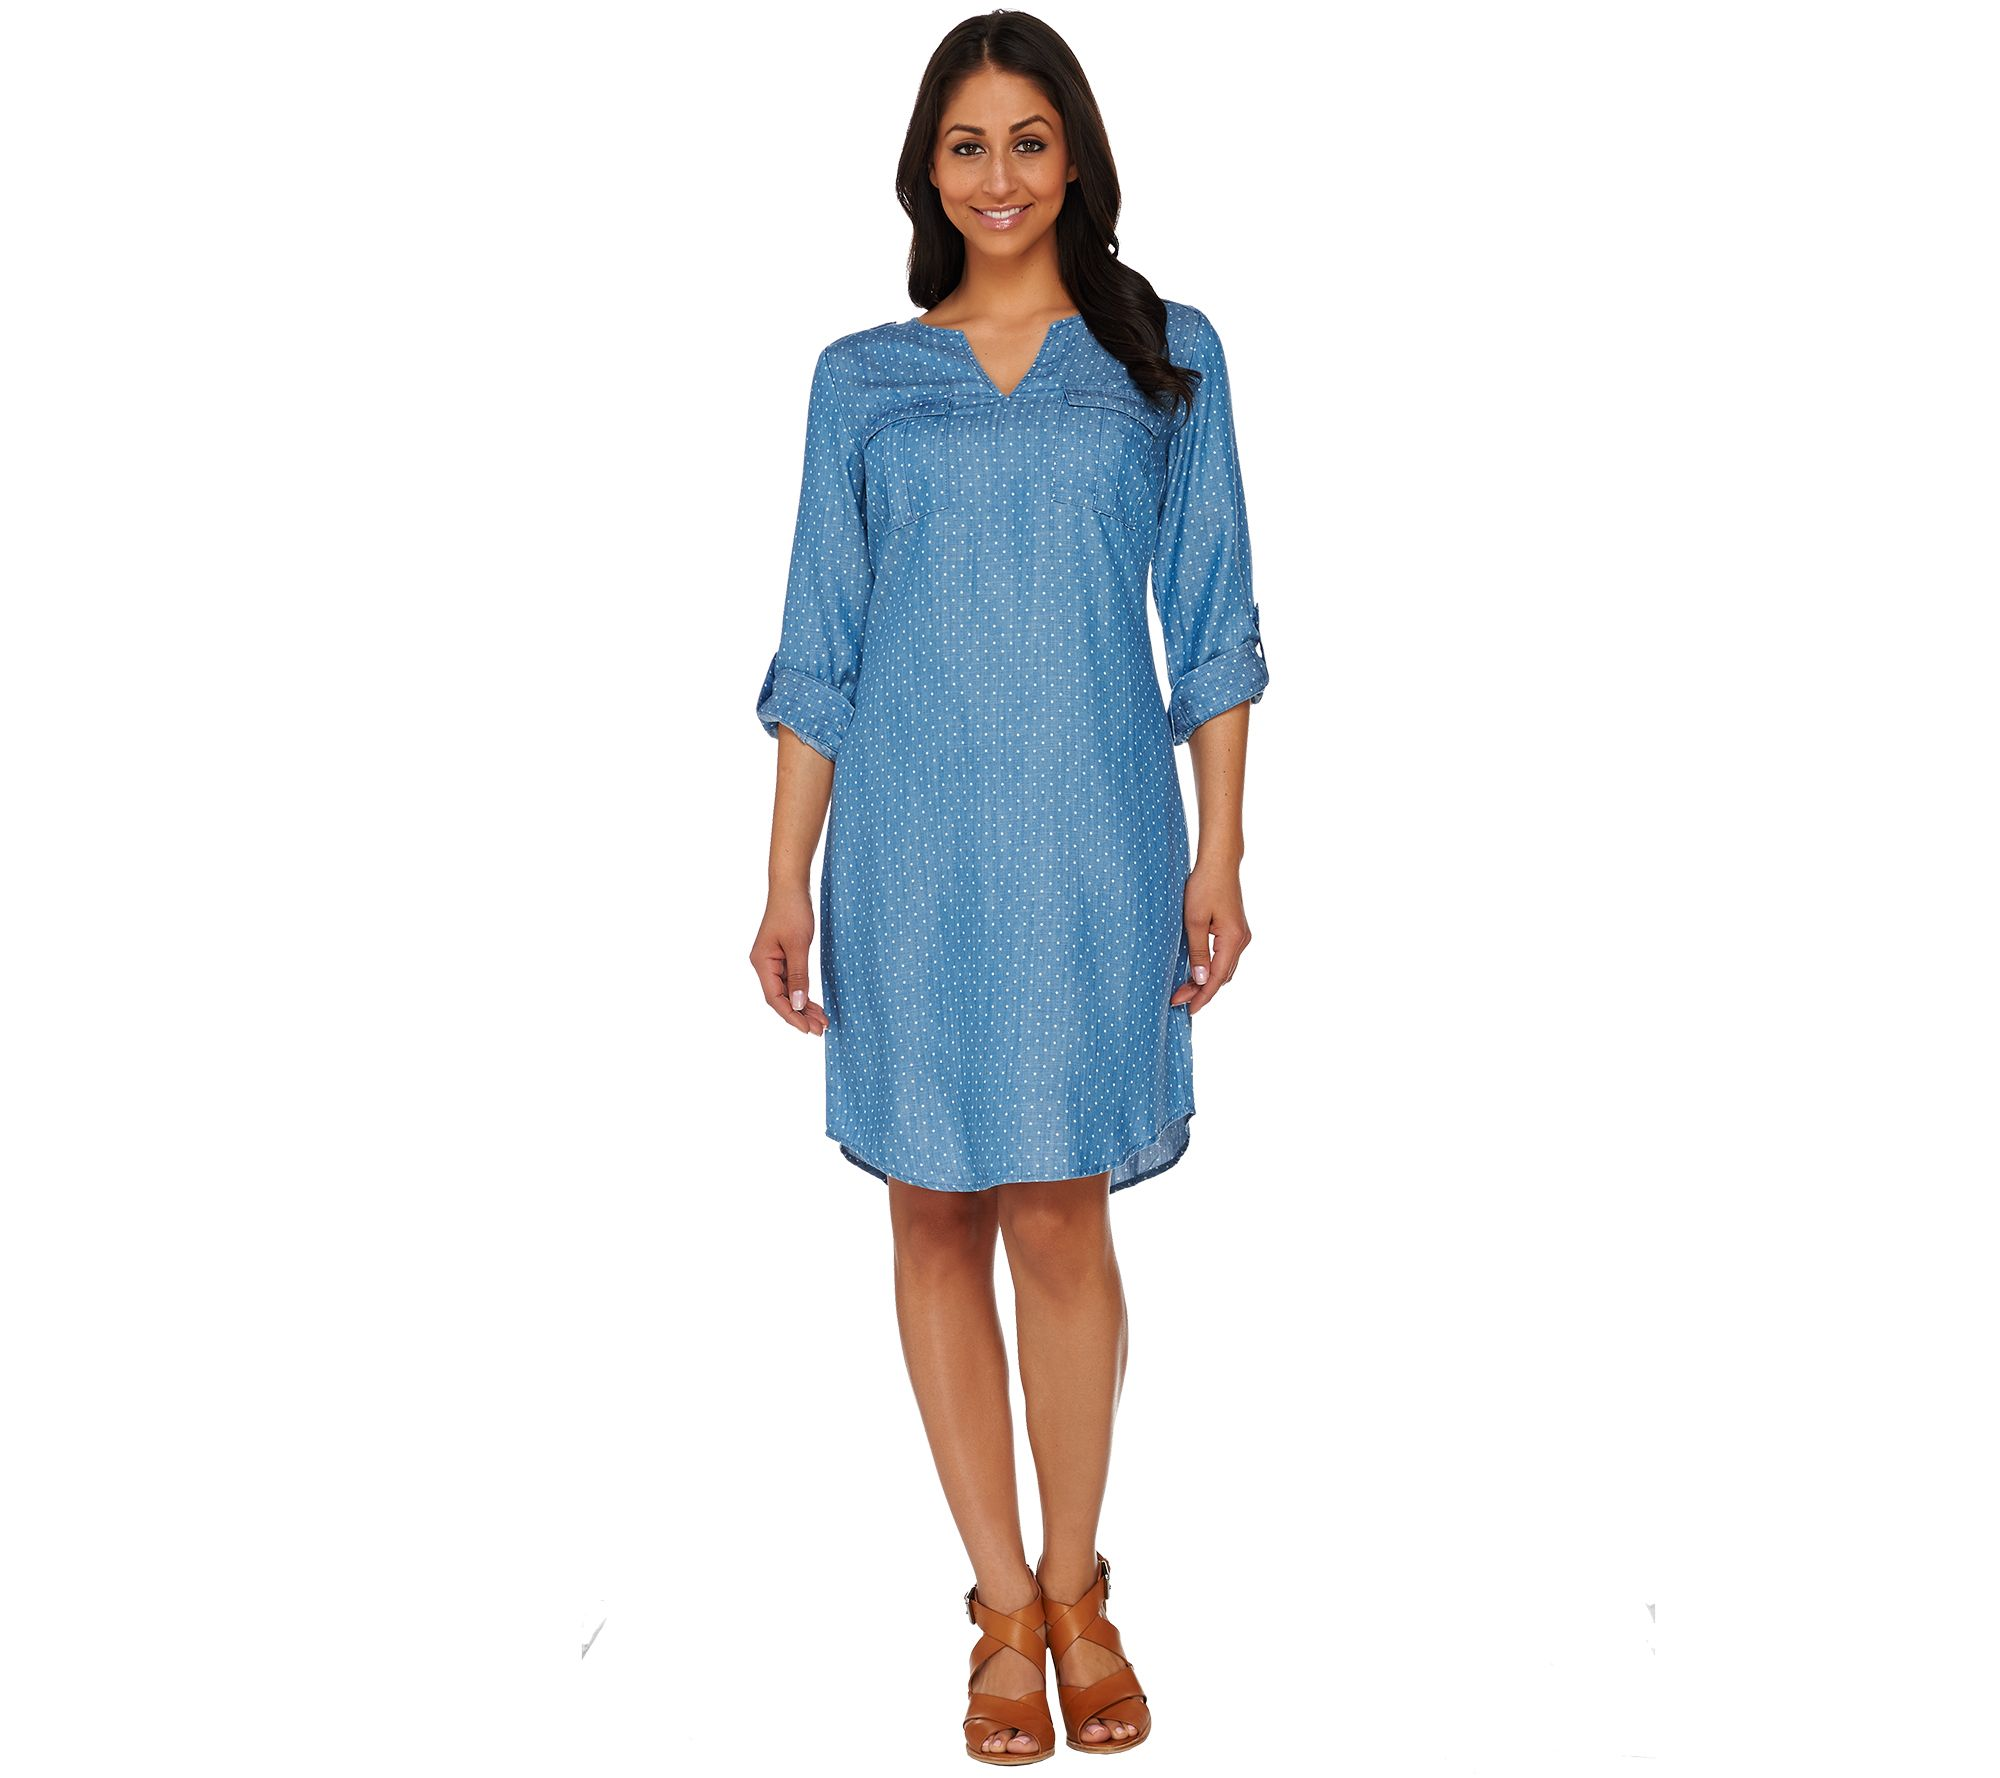 bbea858dfcf C. Wonder Polka Dot Print Chambray Shirt Dress with Pockets - Page 1 —  QVC.com